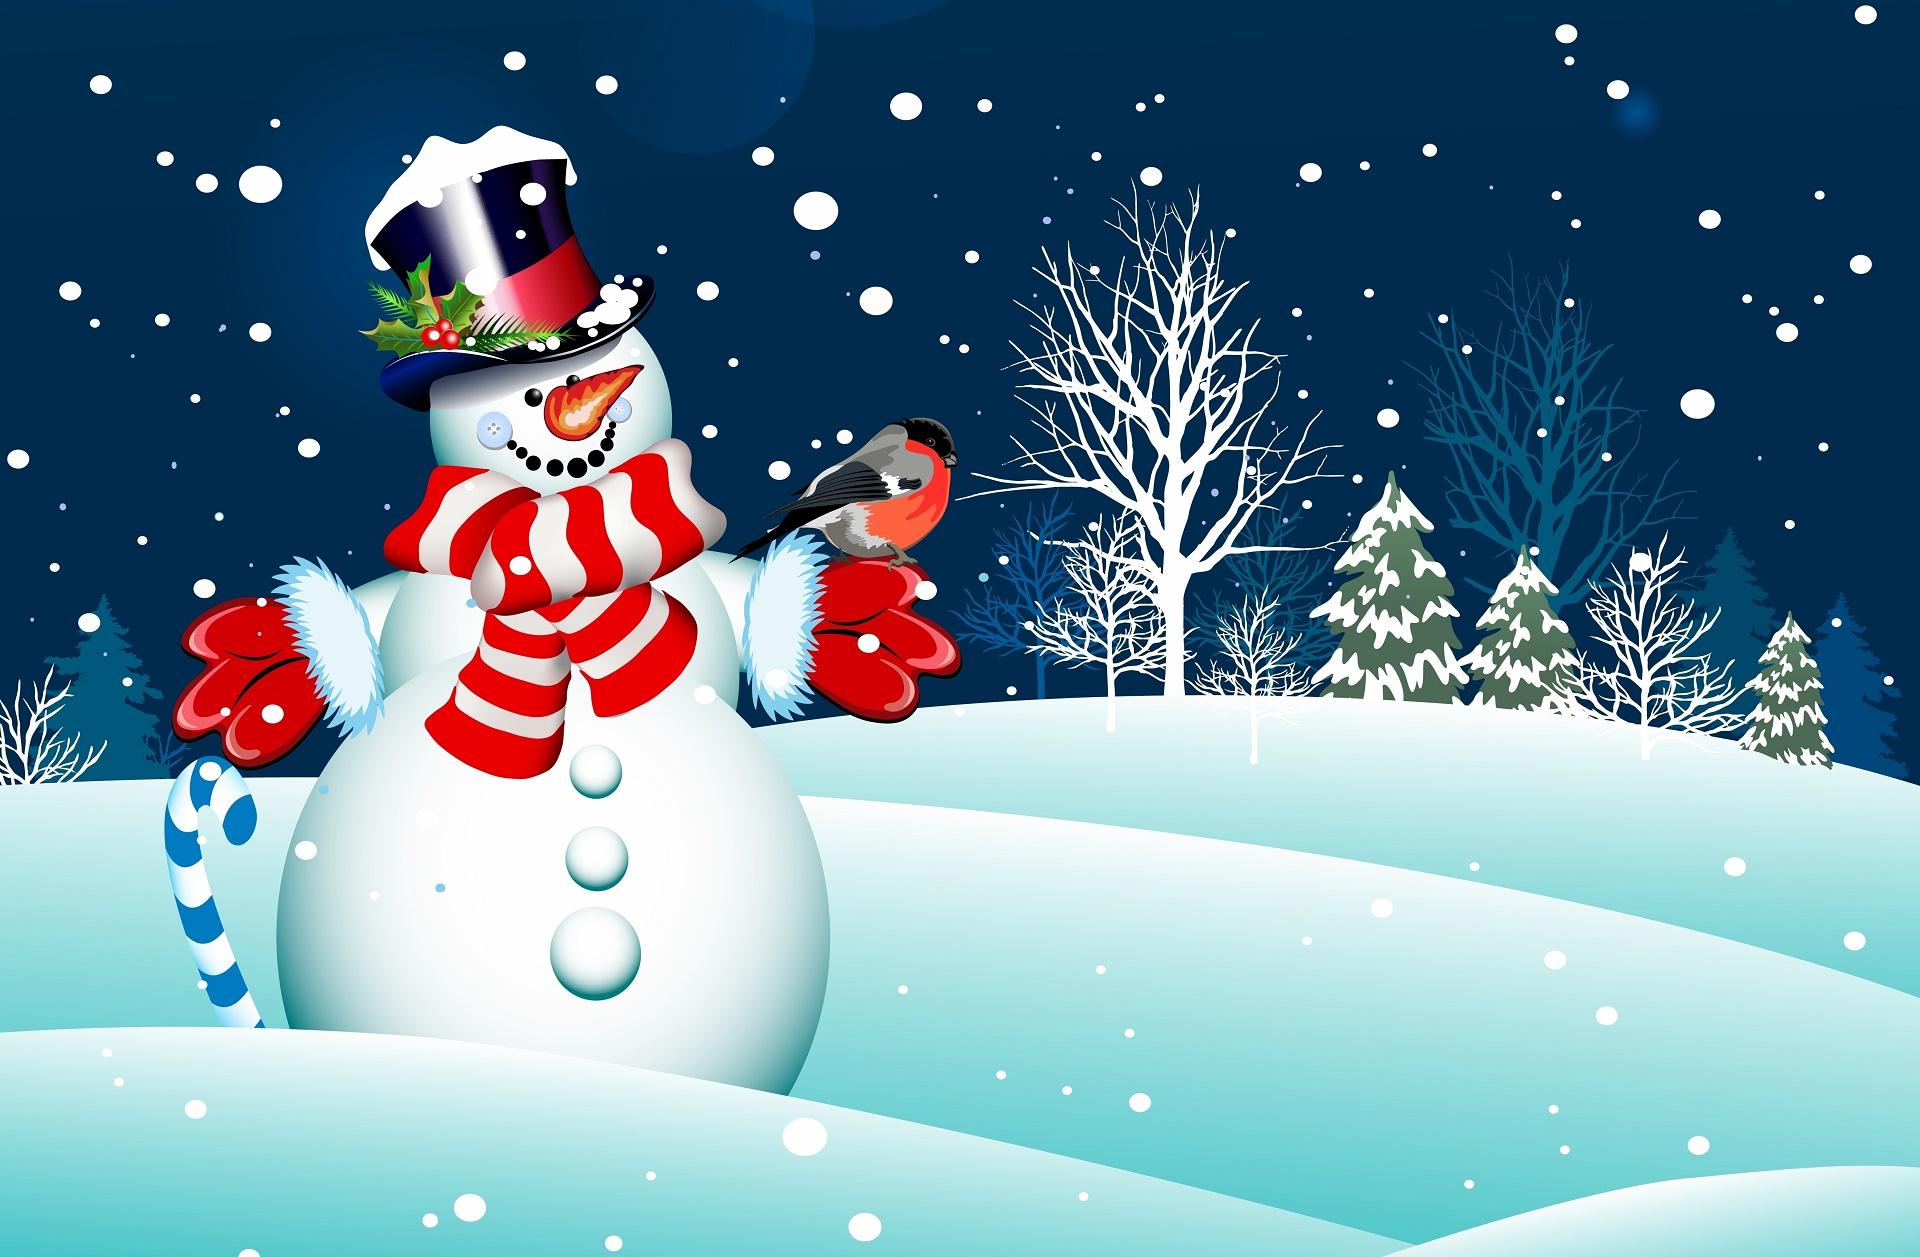 snowman-19.jpg